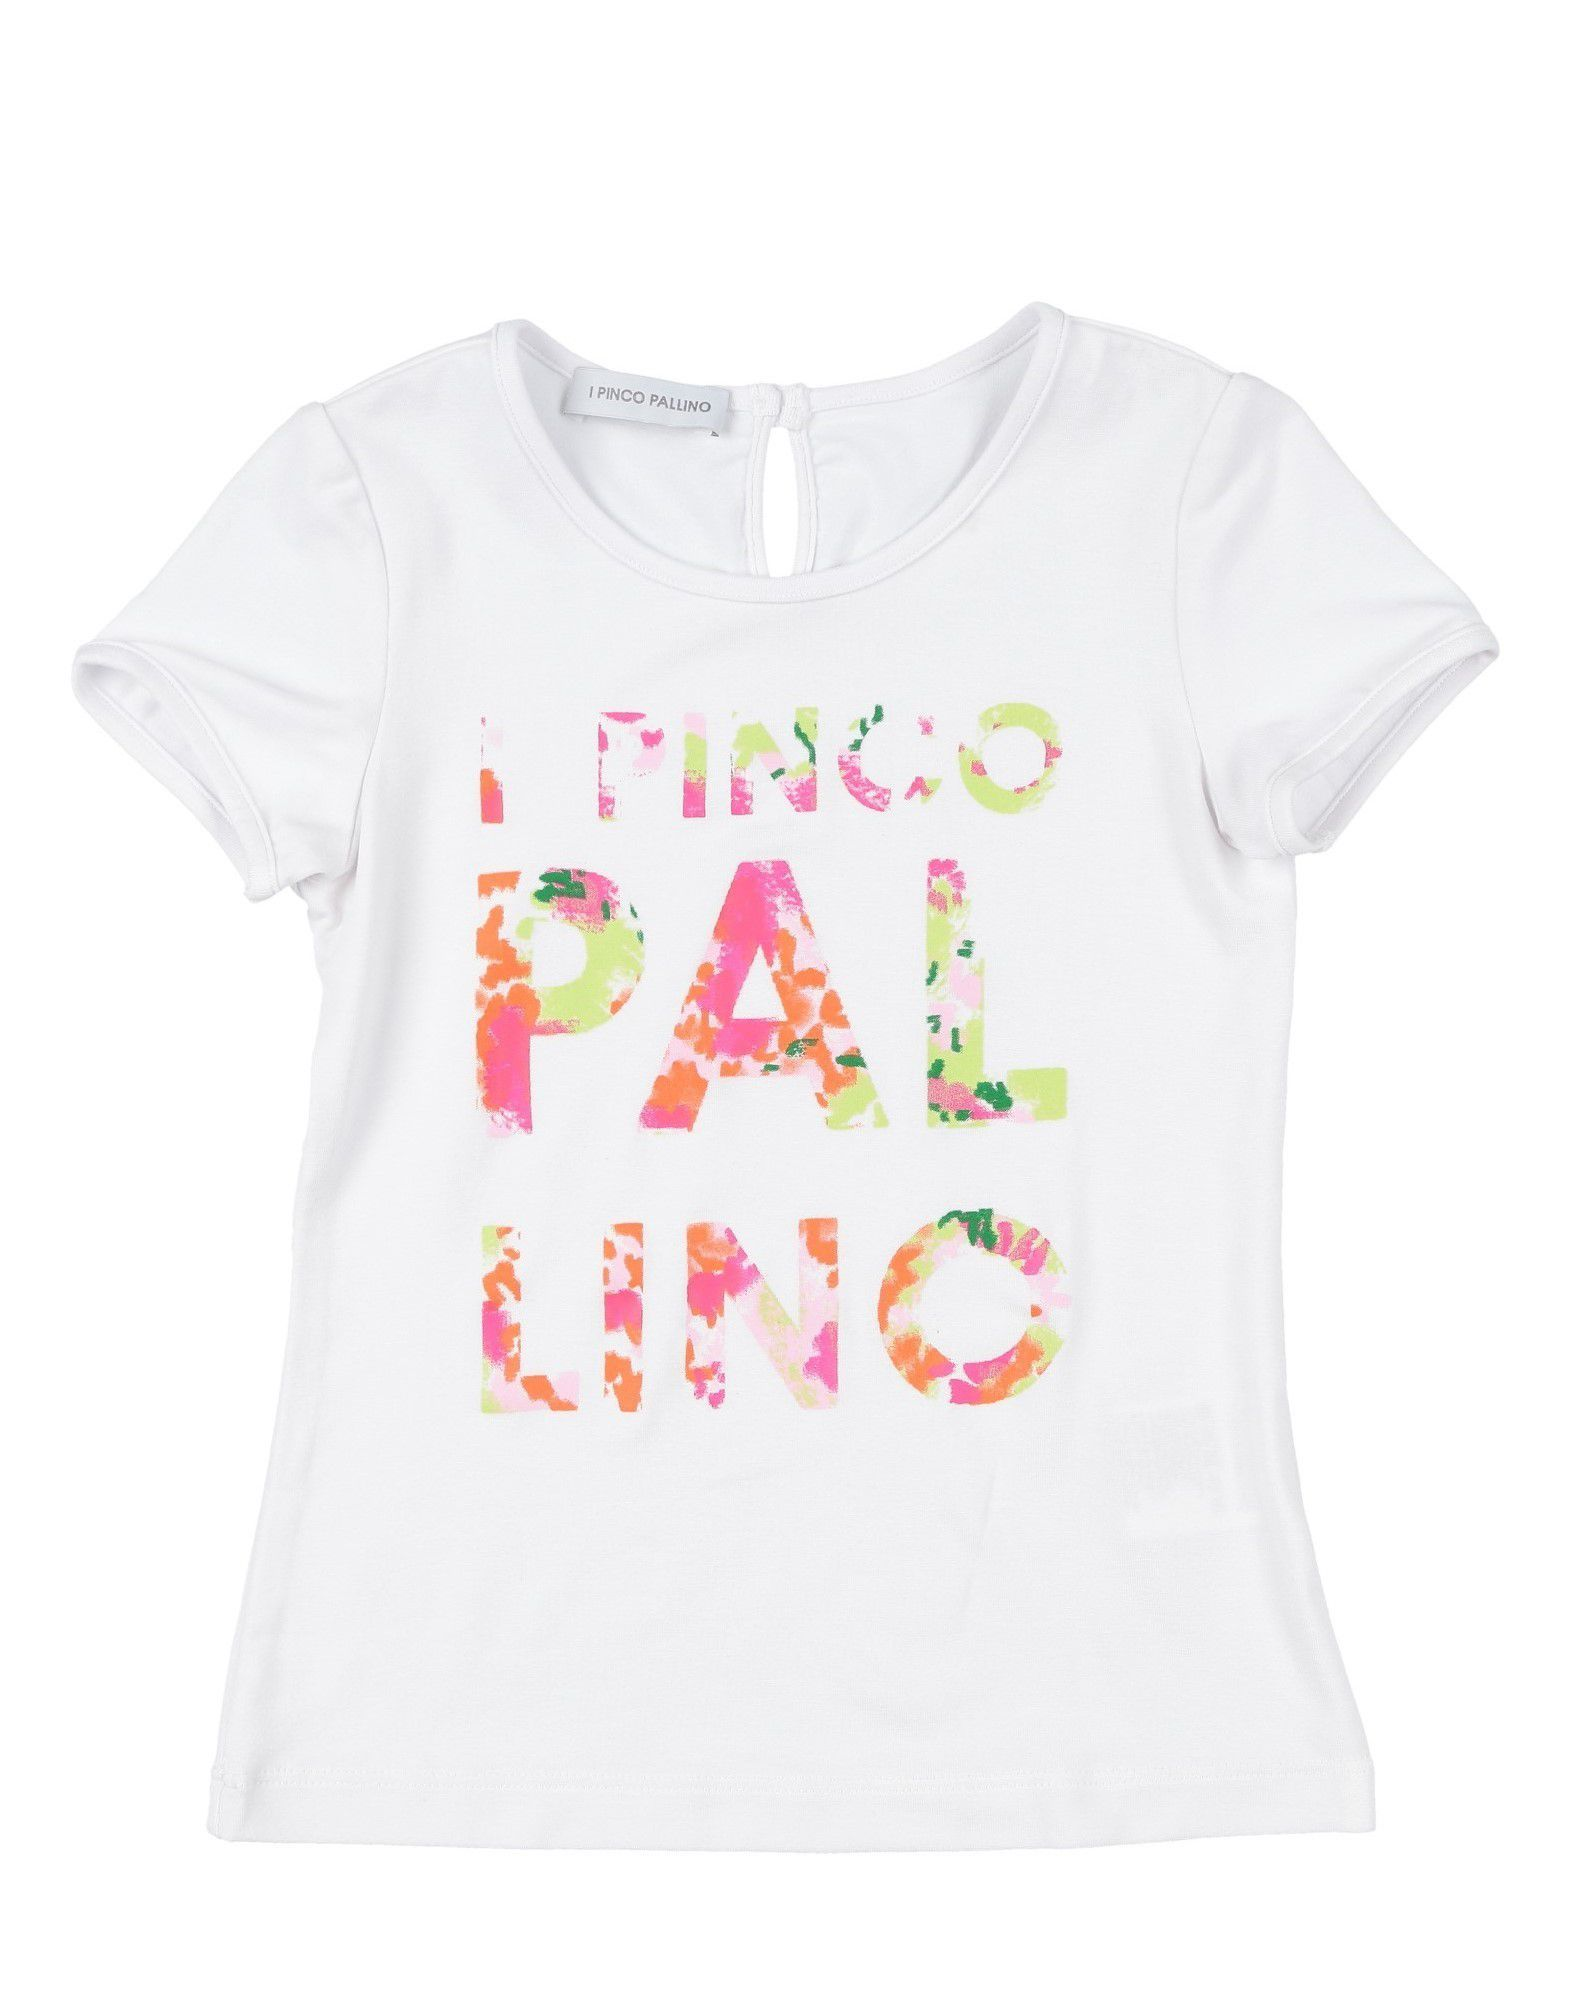 TOPWEAR Girl I Pinco Pallino White Viscose